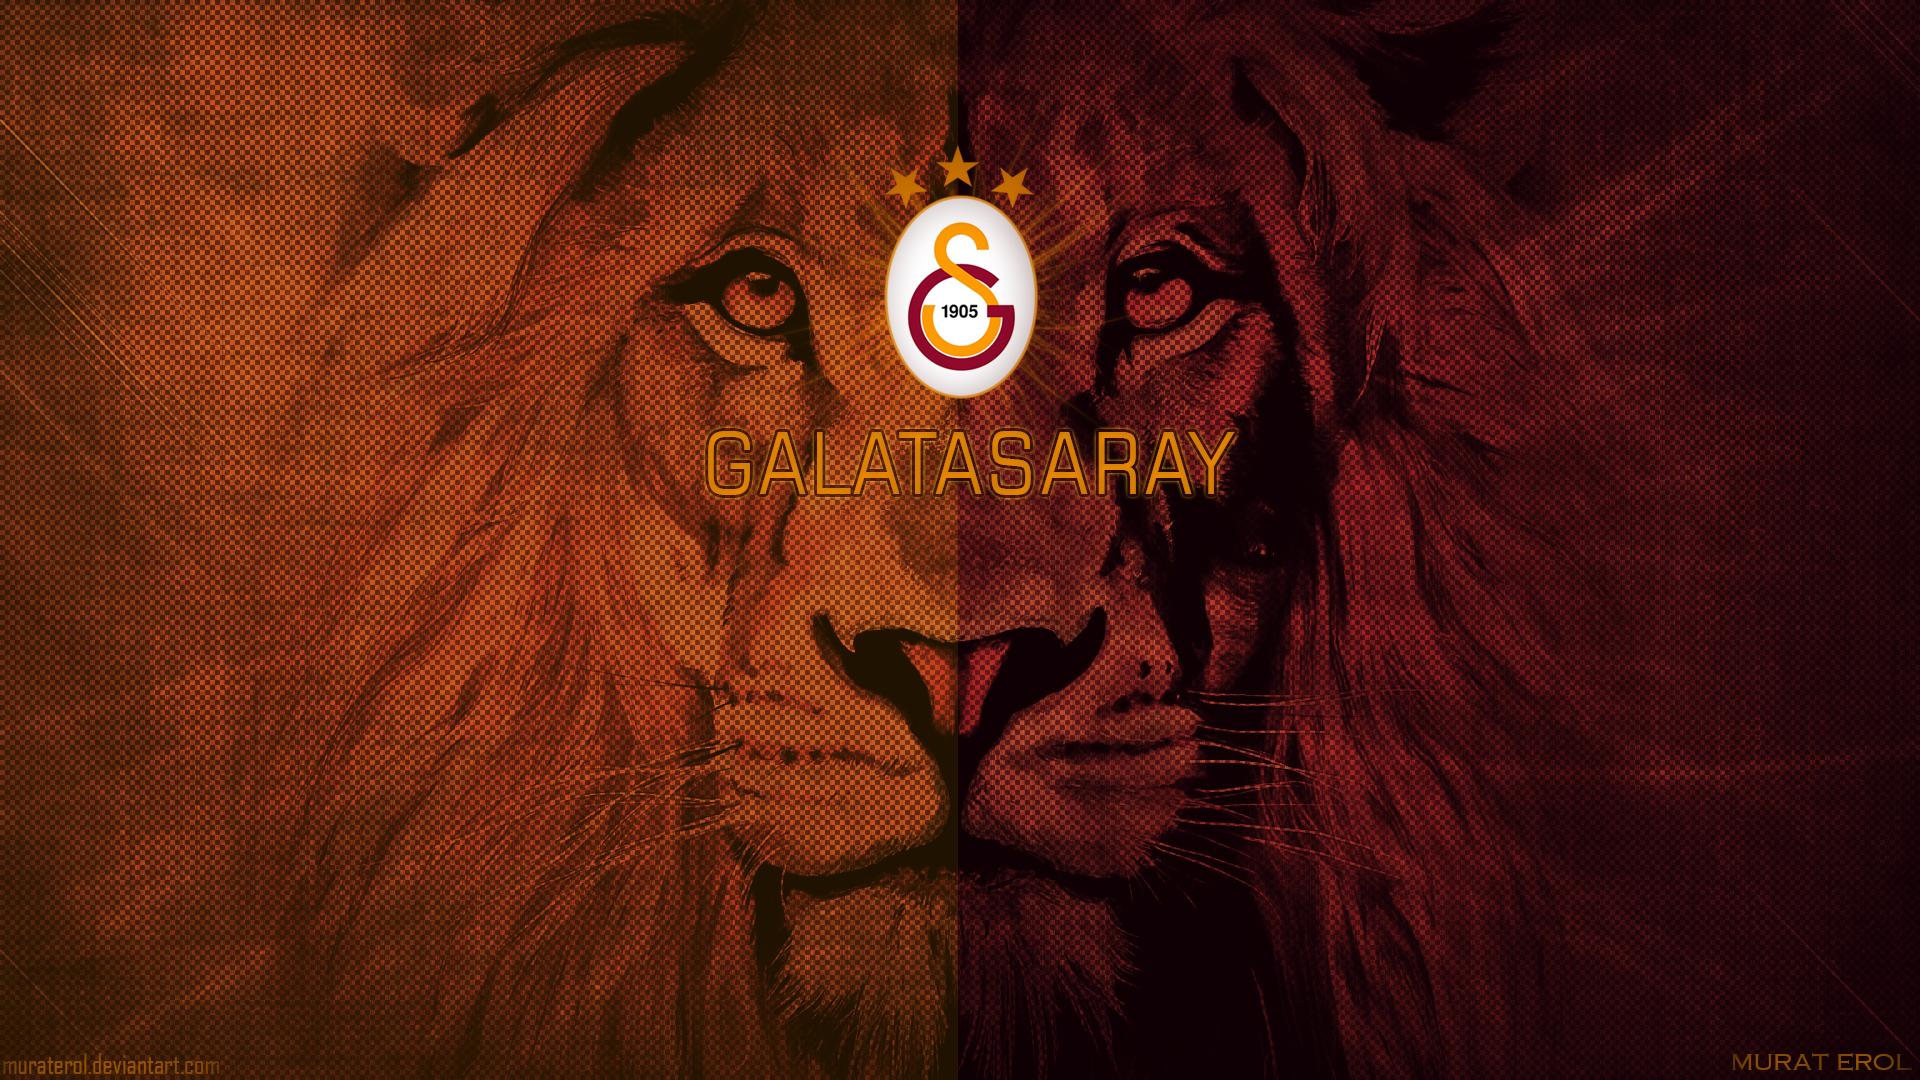 Galatasaray SK HD Wallpaper Background Image 1920x1080 ID 1920x1080